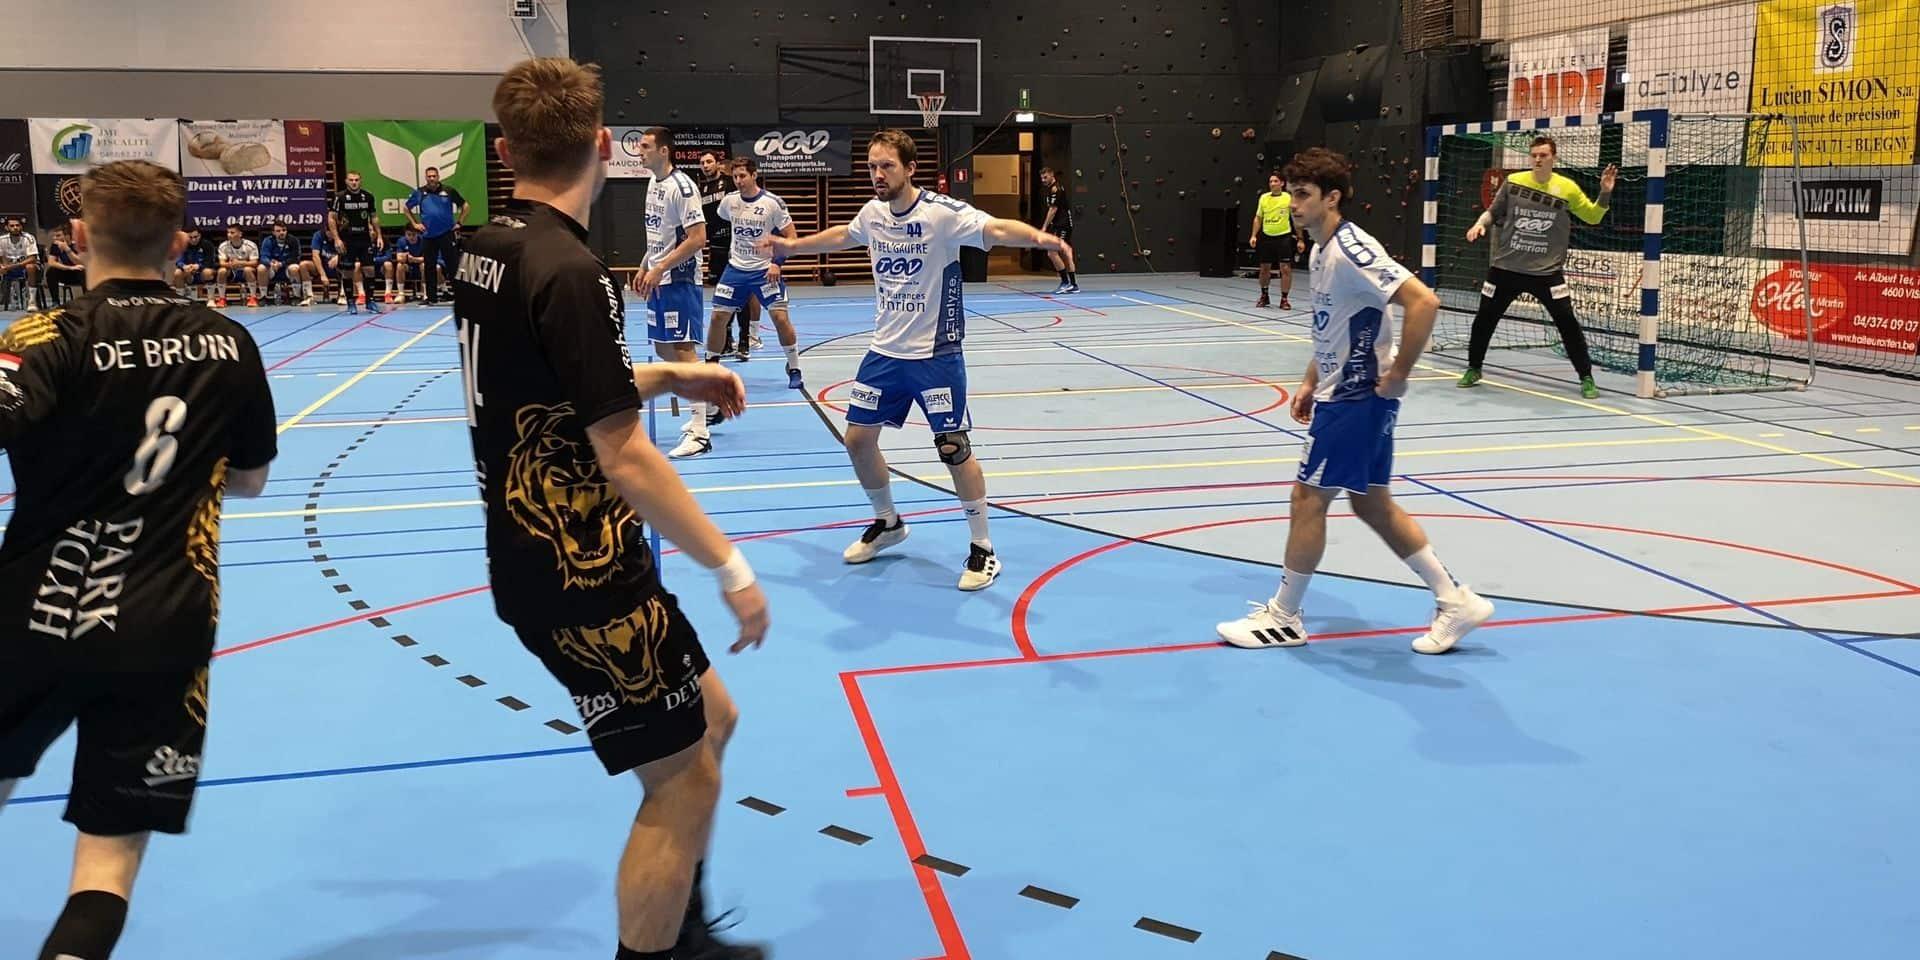 Handball: Visé a été mené de bout en bout par Aalsmeer (24-31)